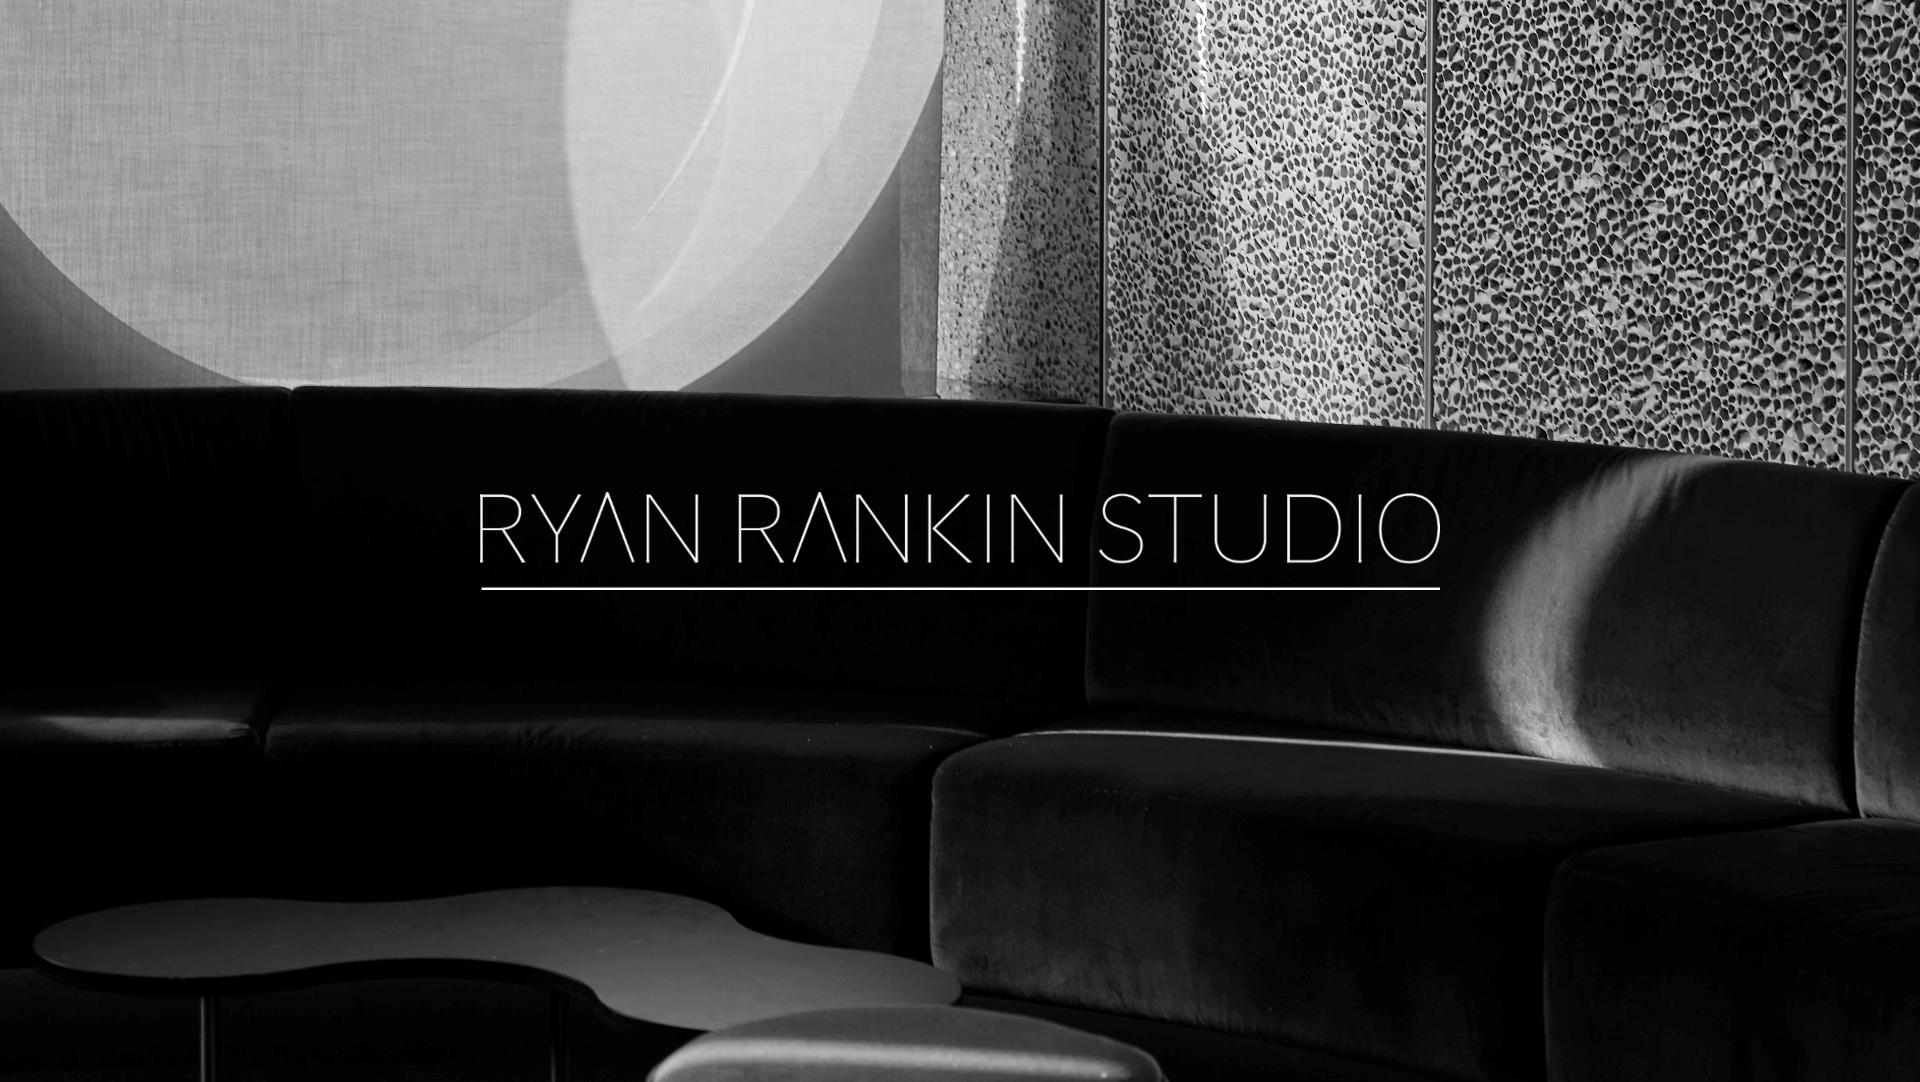 Ryan Rankin Studio Slider Image Sofa with Logo